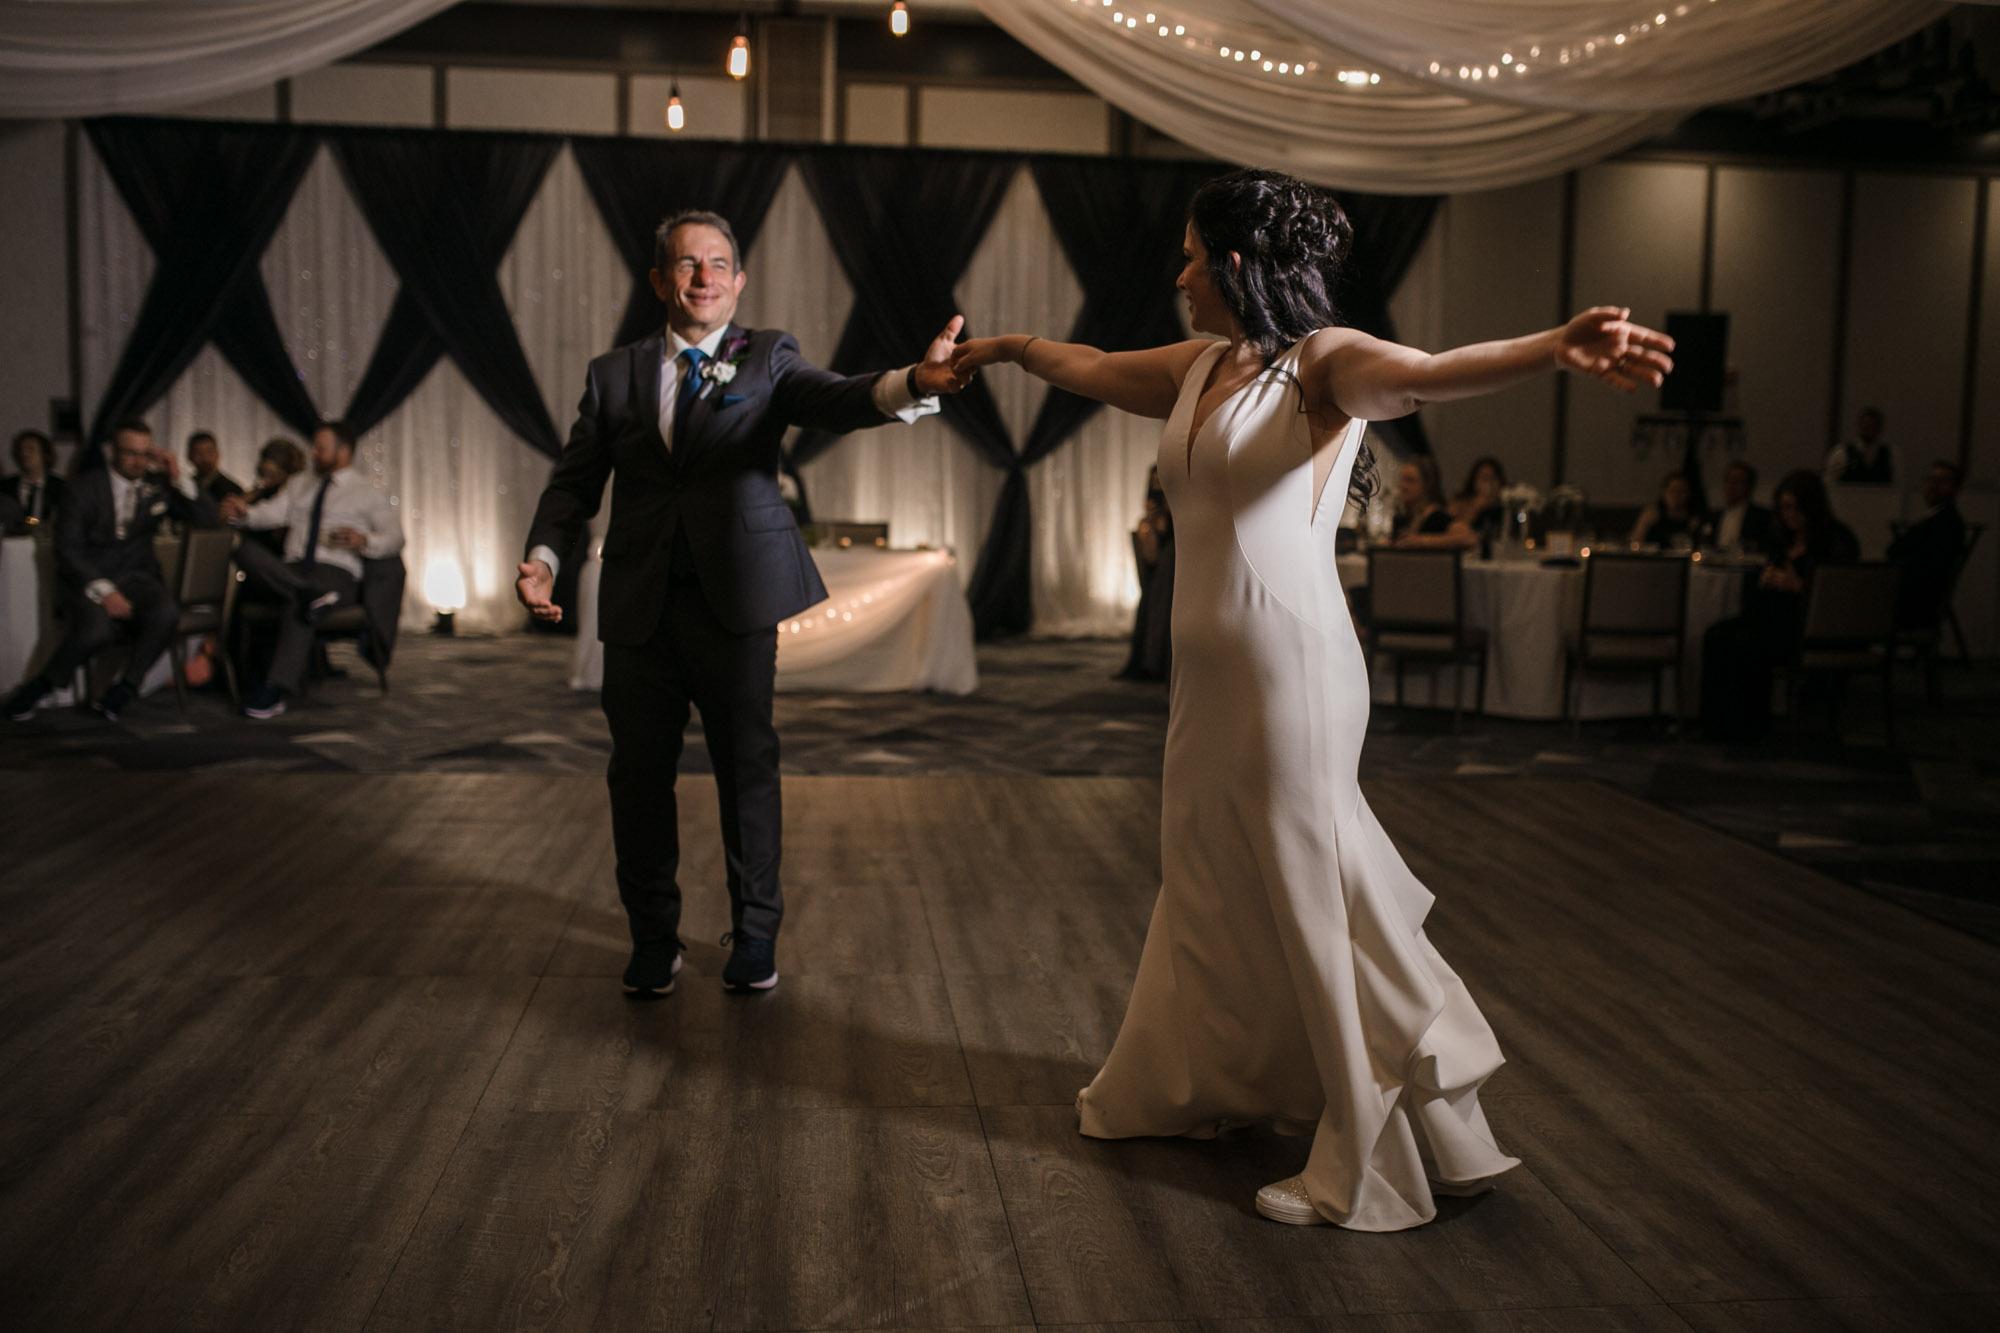 renaissance-hotel-toledo-wedding-142.jpg